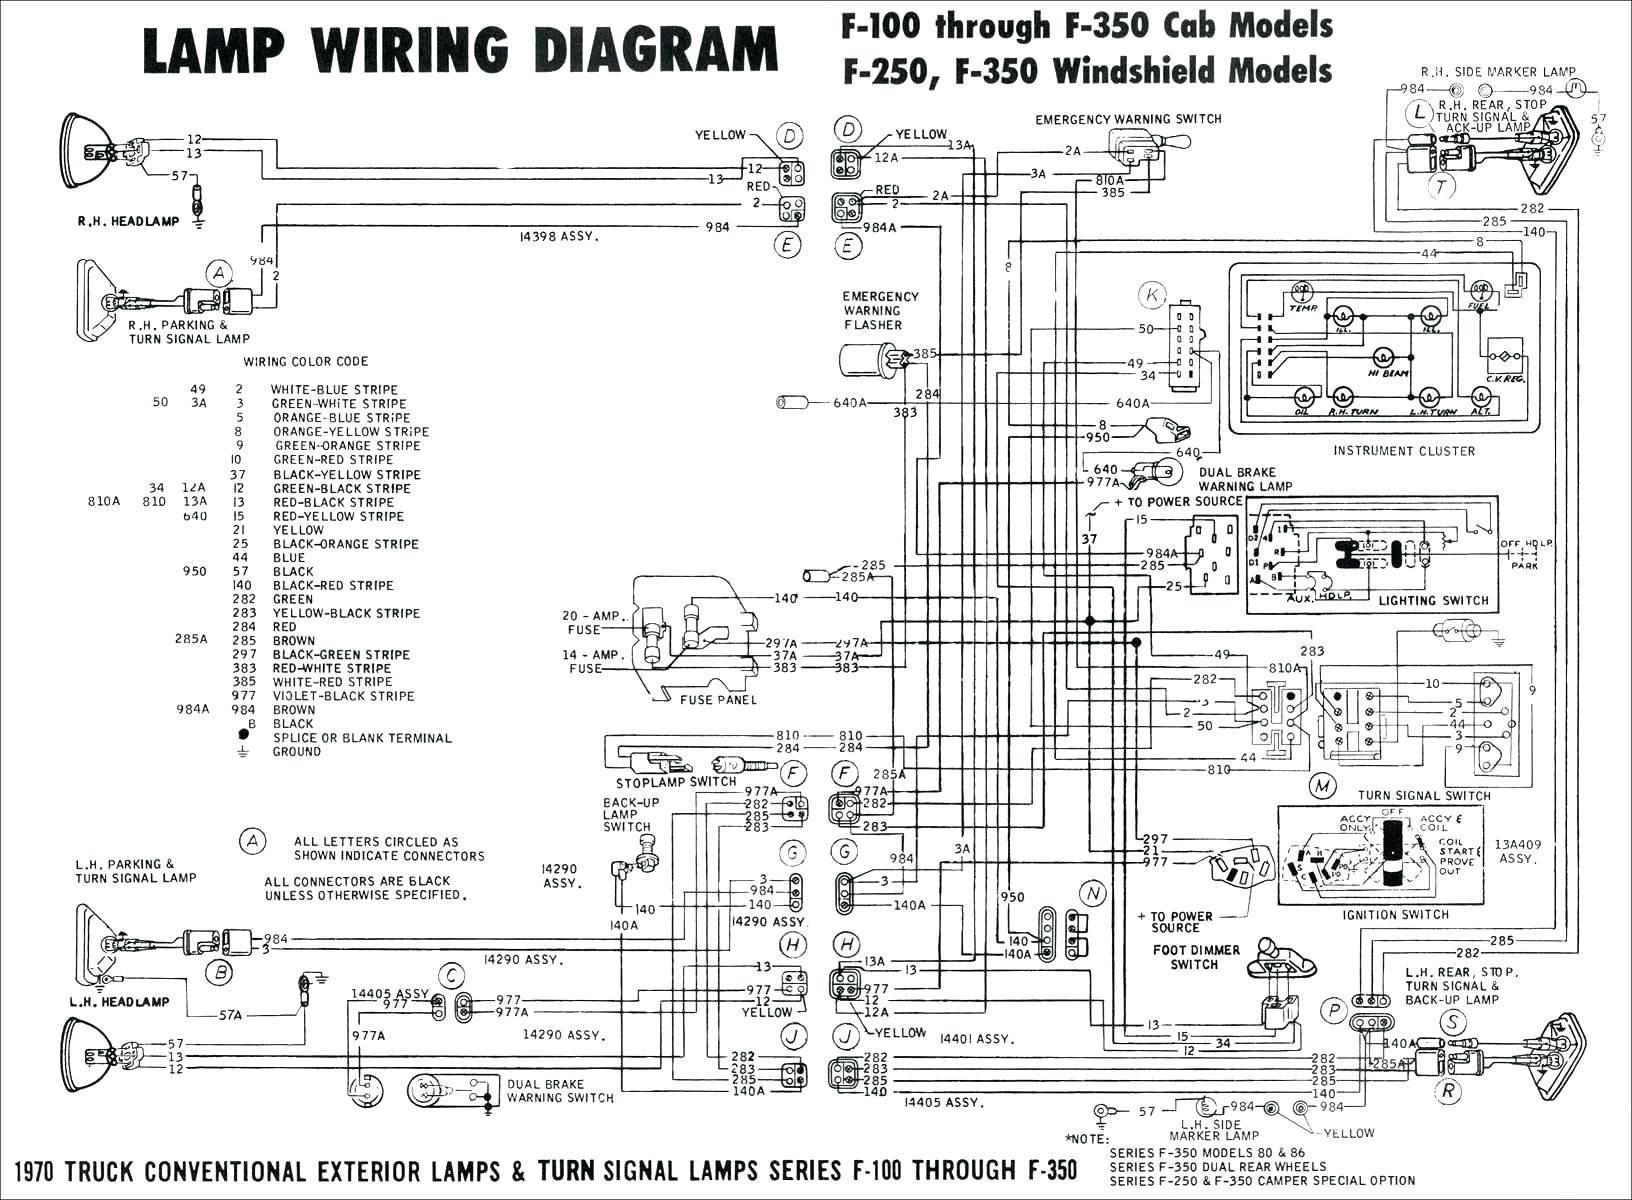 Honda Civic 2002 Wiring Diagram